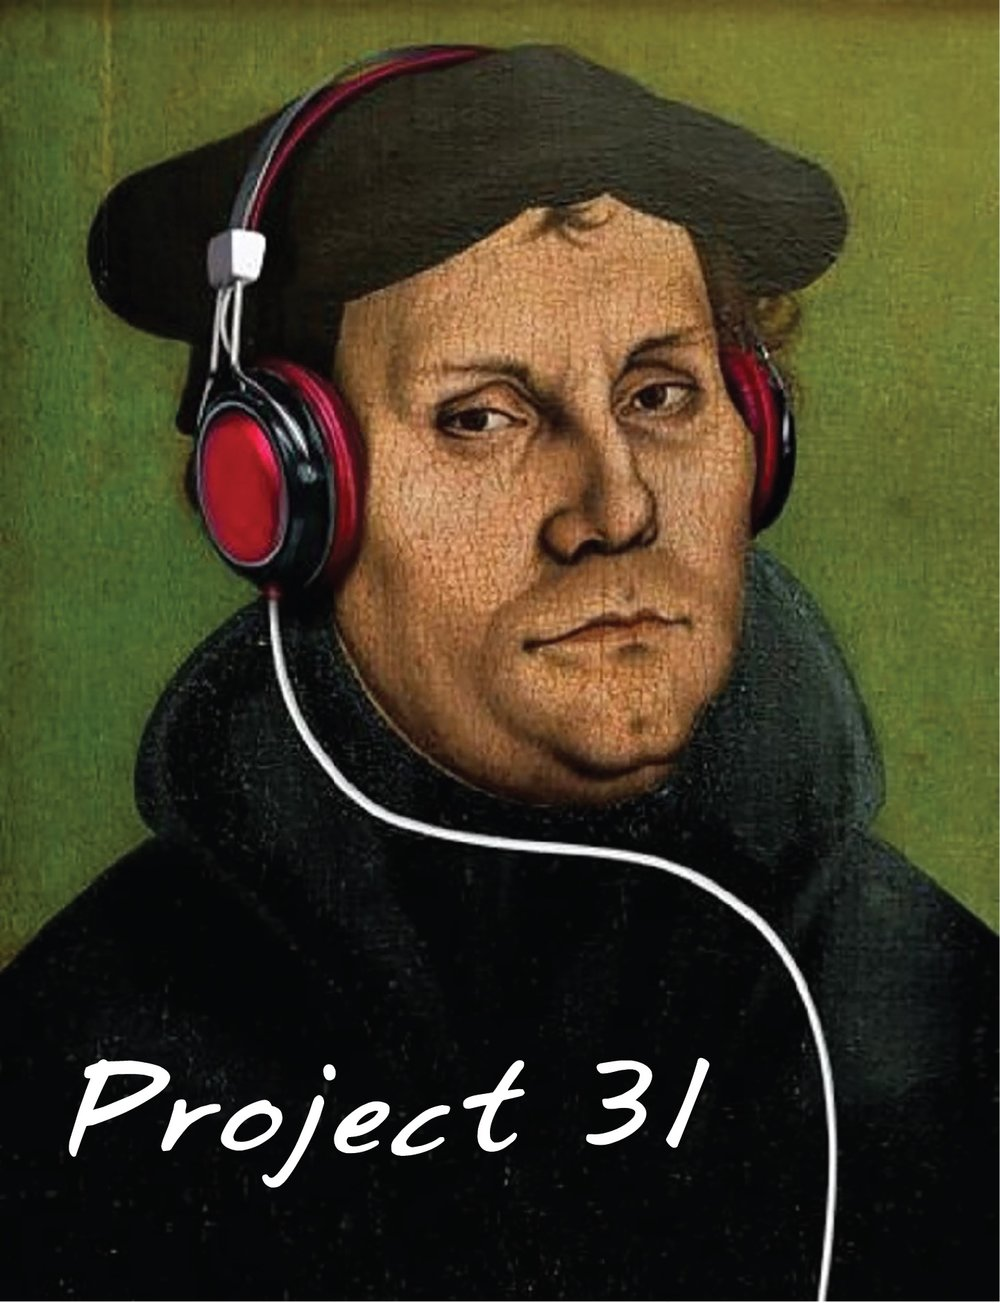 project 31 photo.jpg